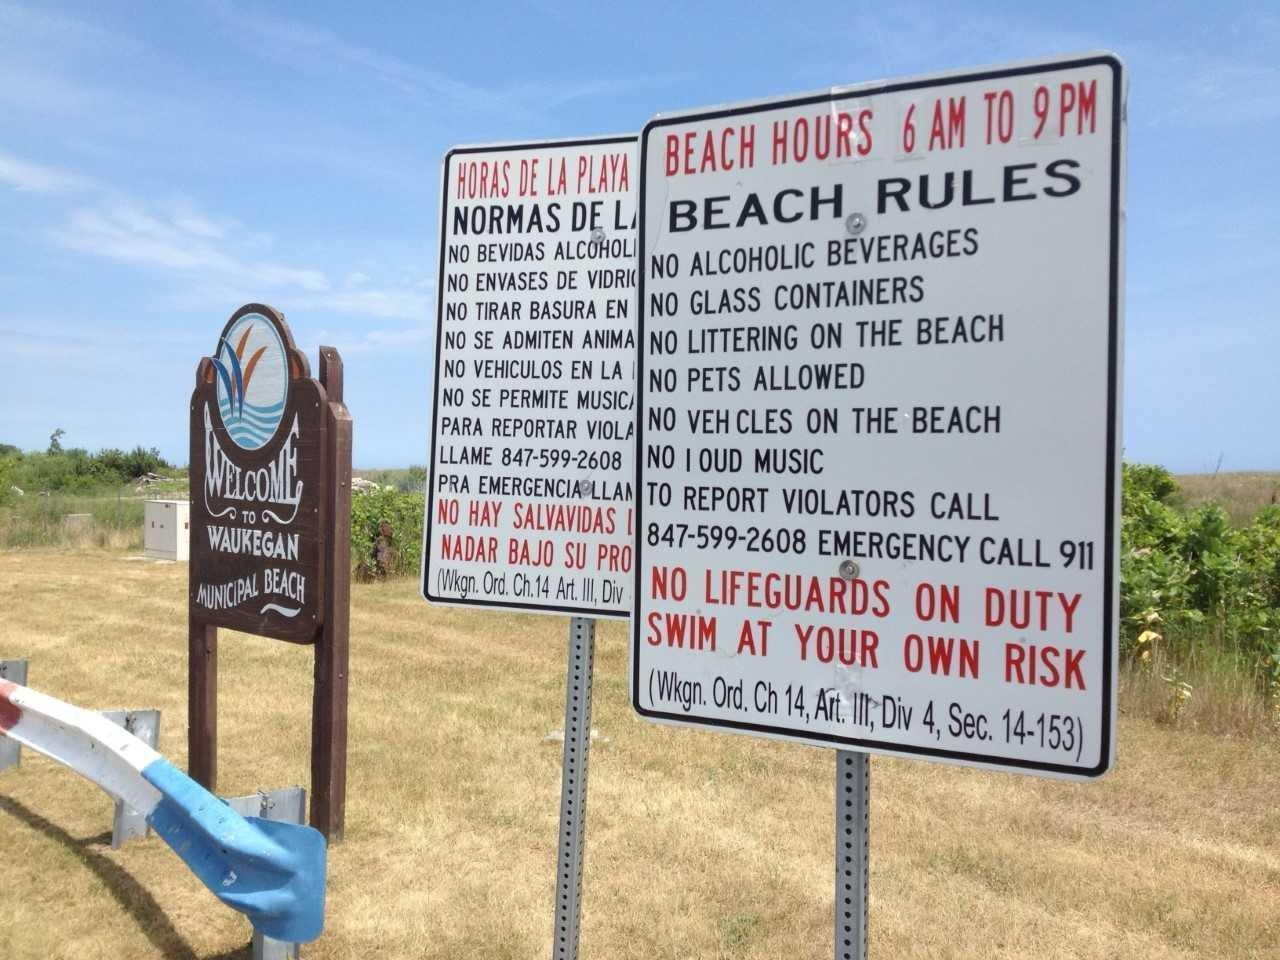 Moran Waukegan Beach Weekend Parking Fee Turns Up The Heat Lake County News Sun